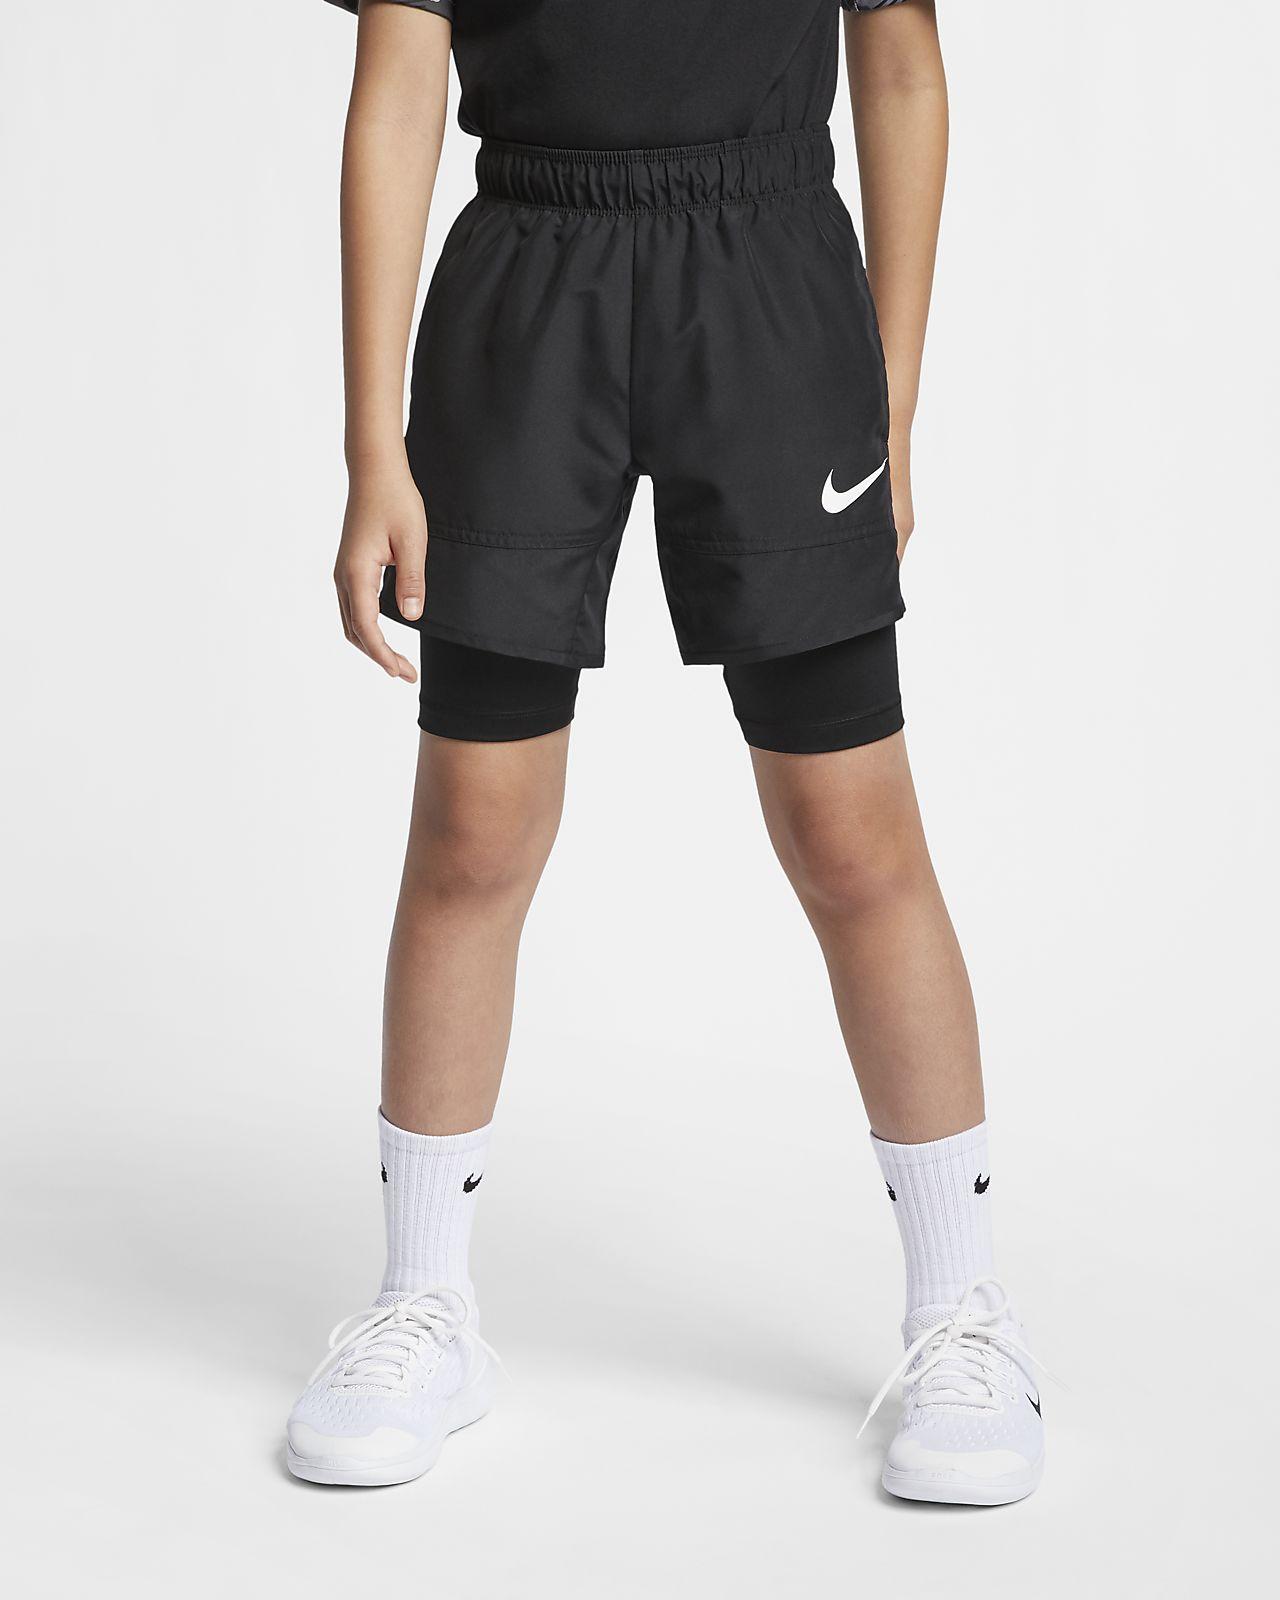 Nike Older Kids' (Boys') Hybrid Training Shorts